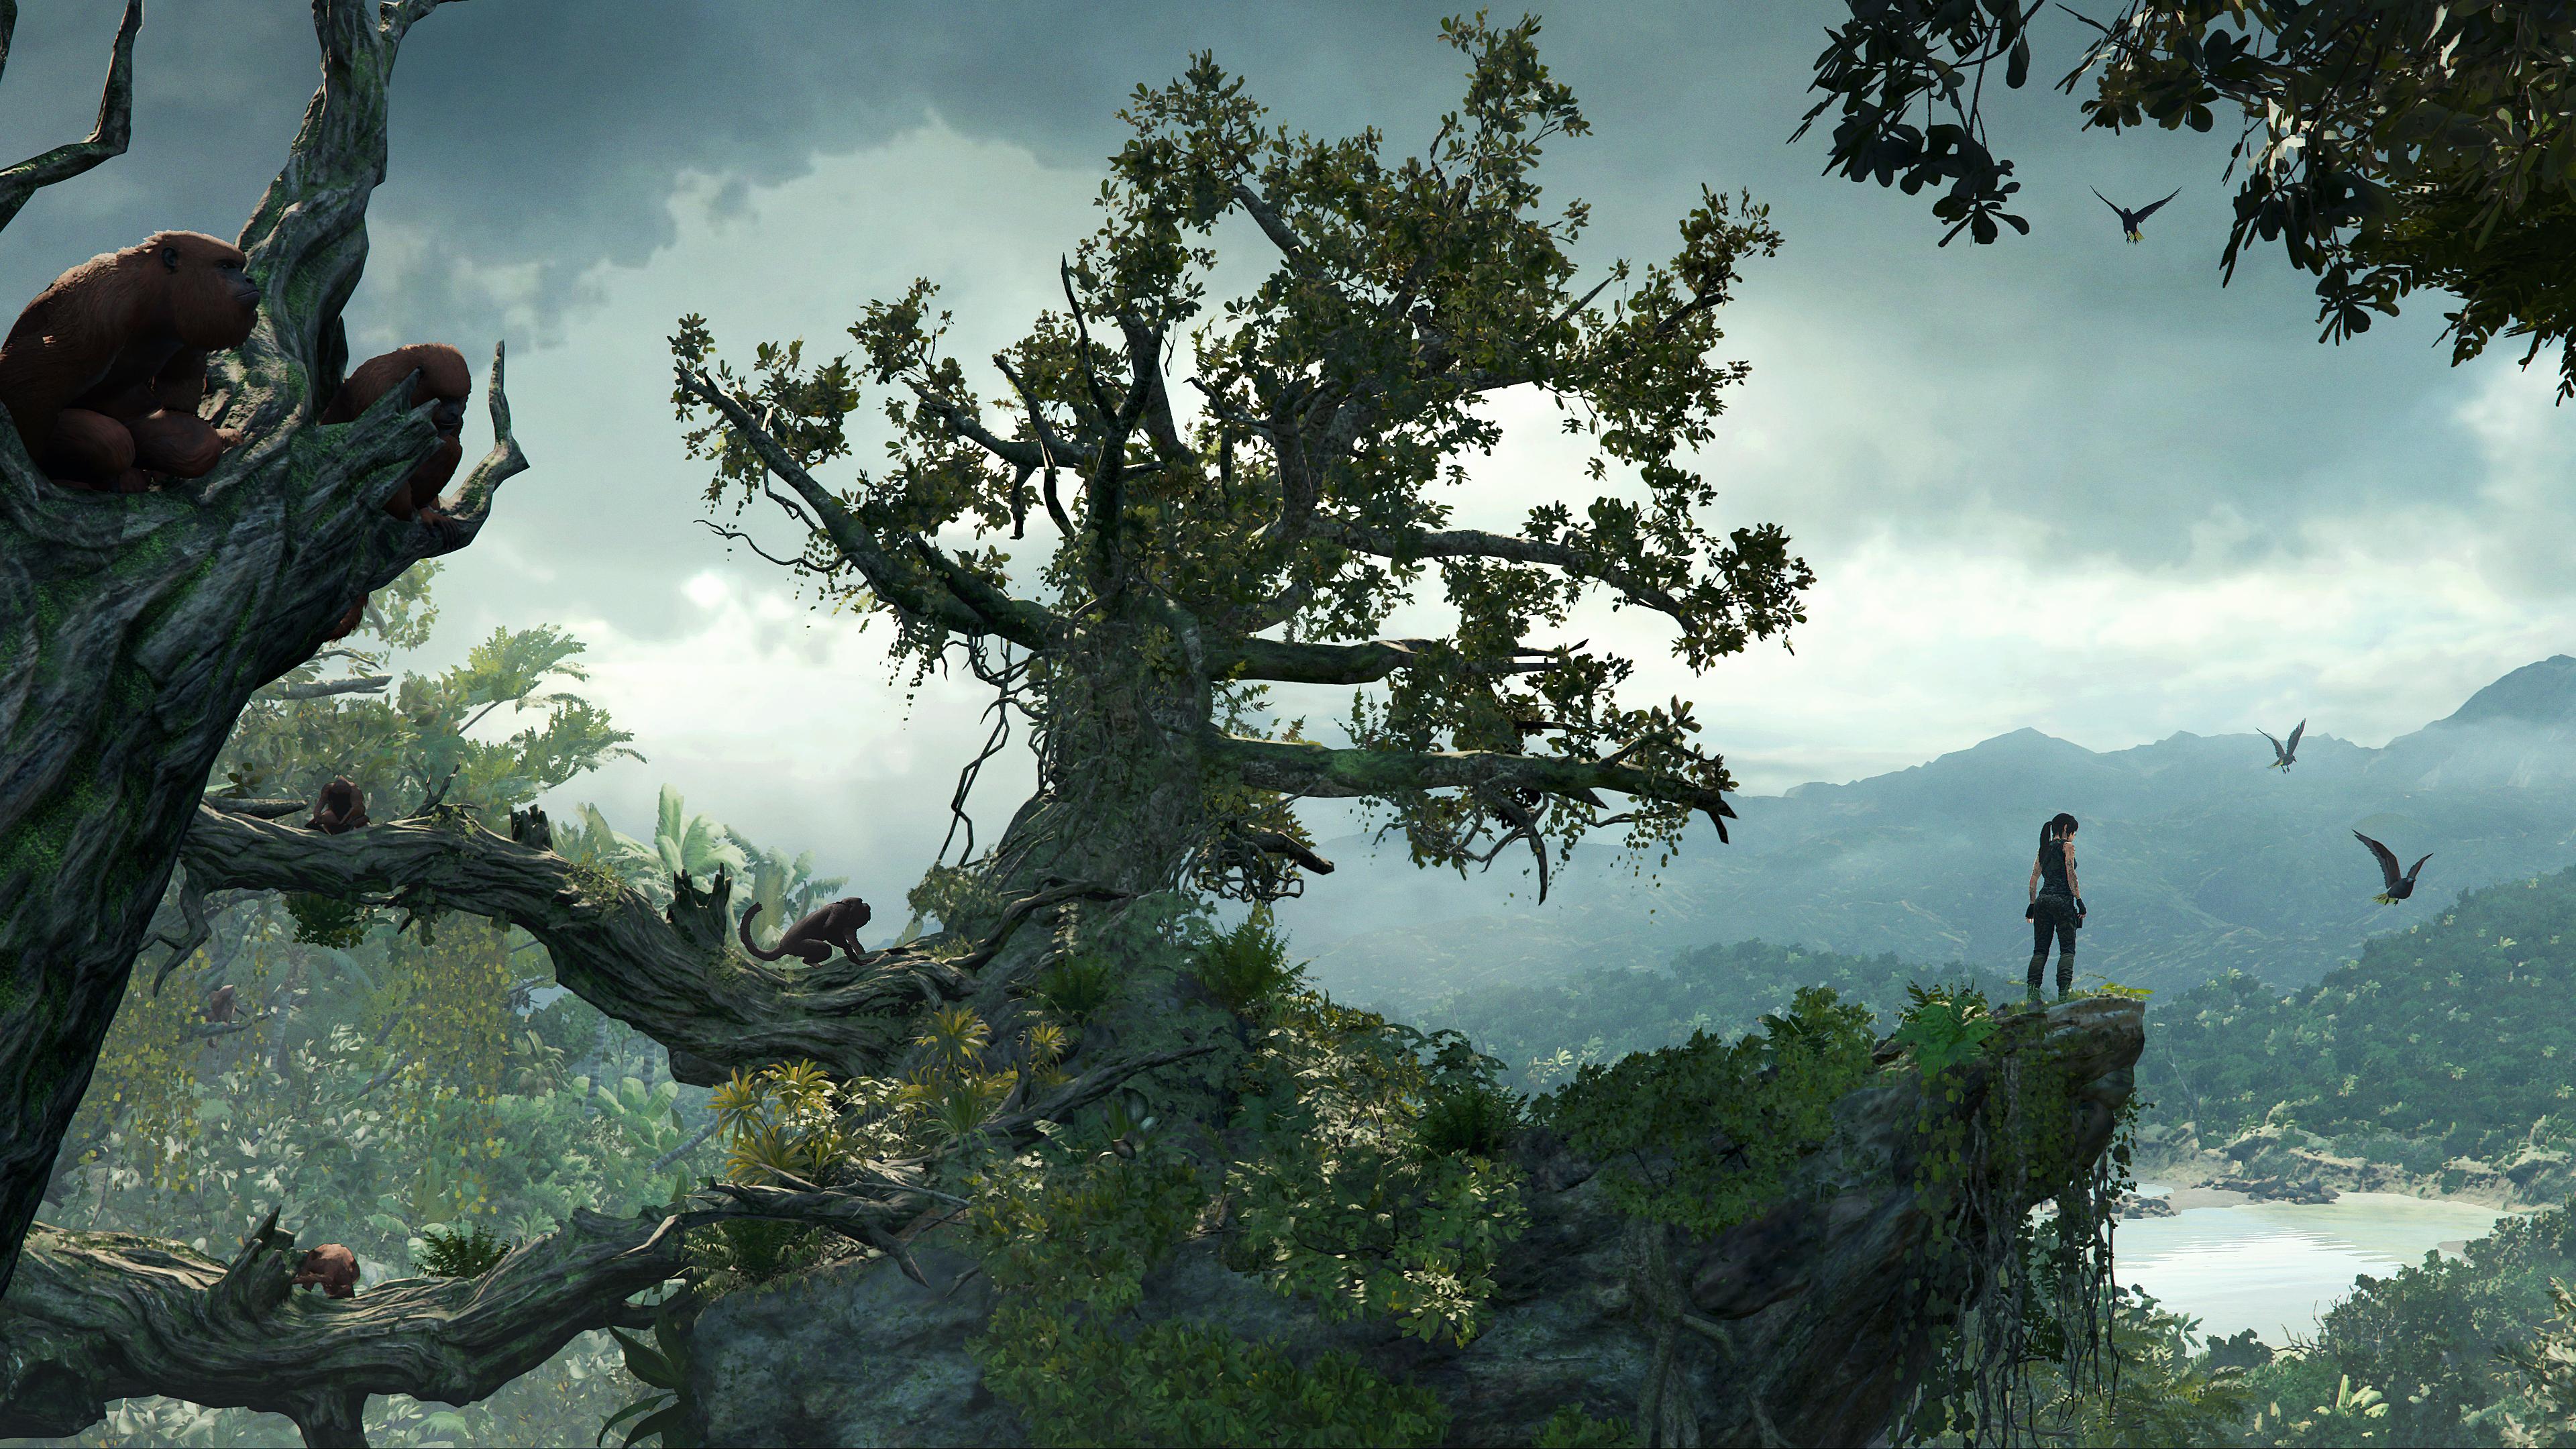 Shadow Of The Tomb Raider Tree And Lara 4k Ultra Hd Wallpaper